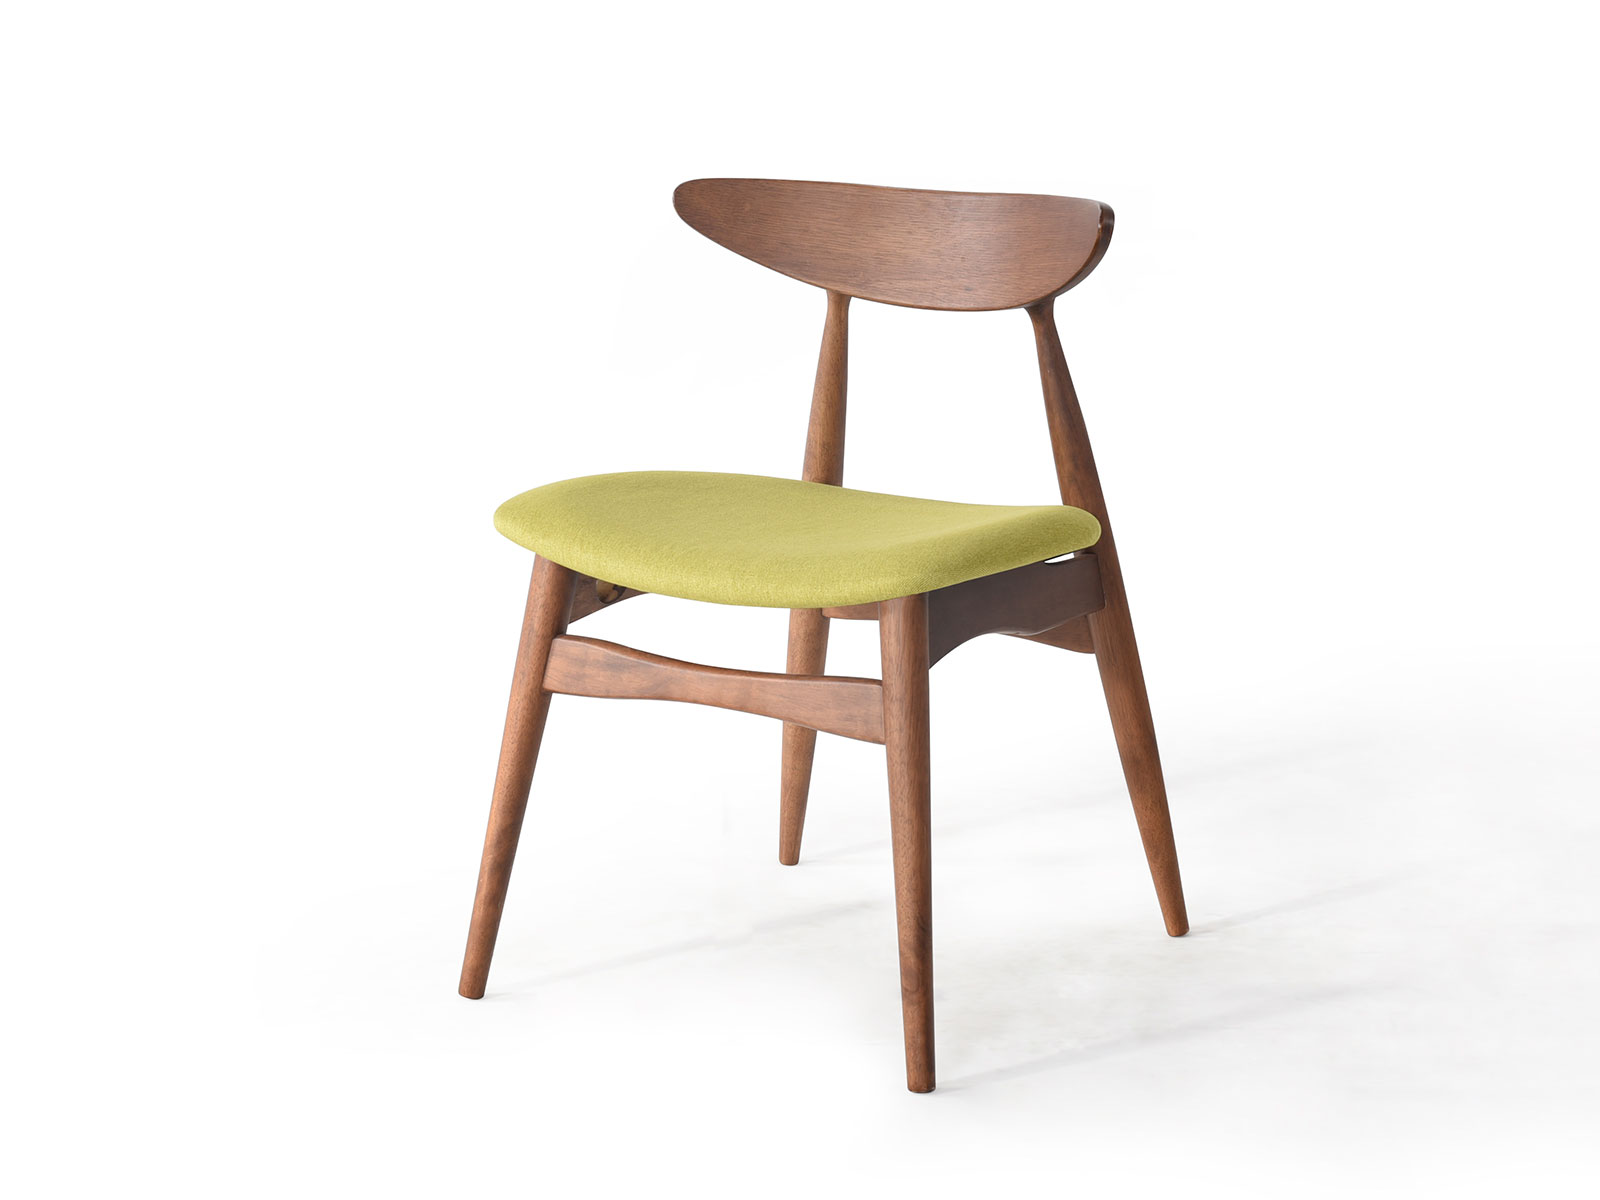 Scaun din lemn cu sezut tapitat cu piele ecologica Jana Green l52xA495xH73 cm